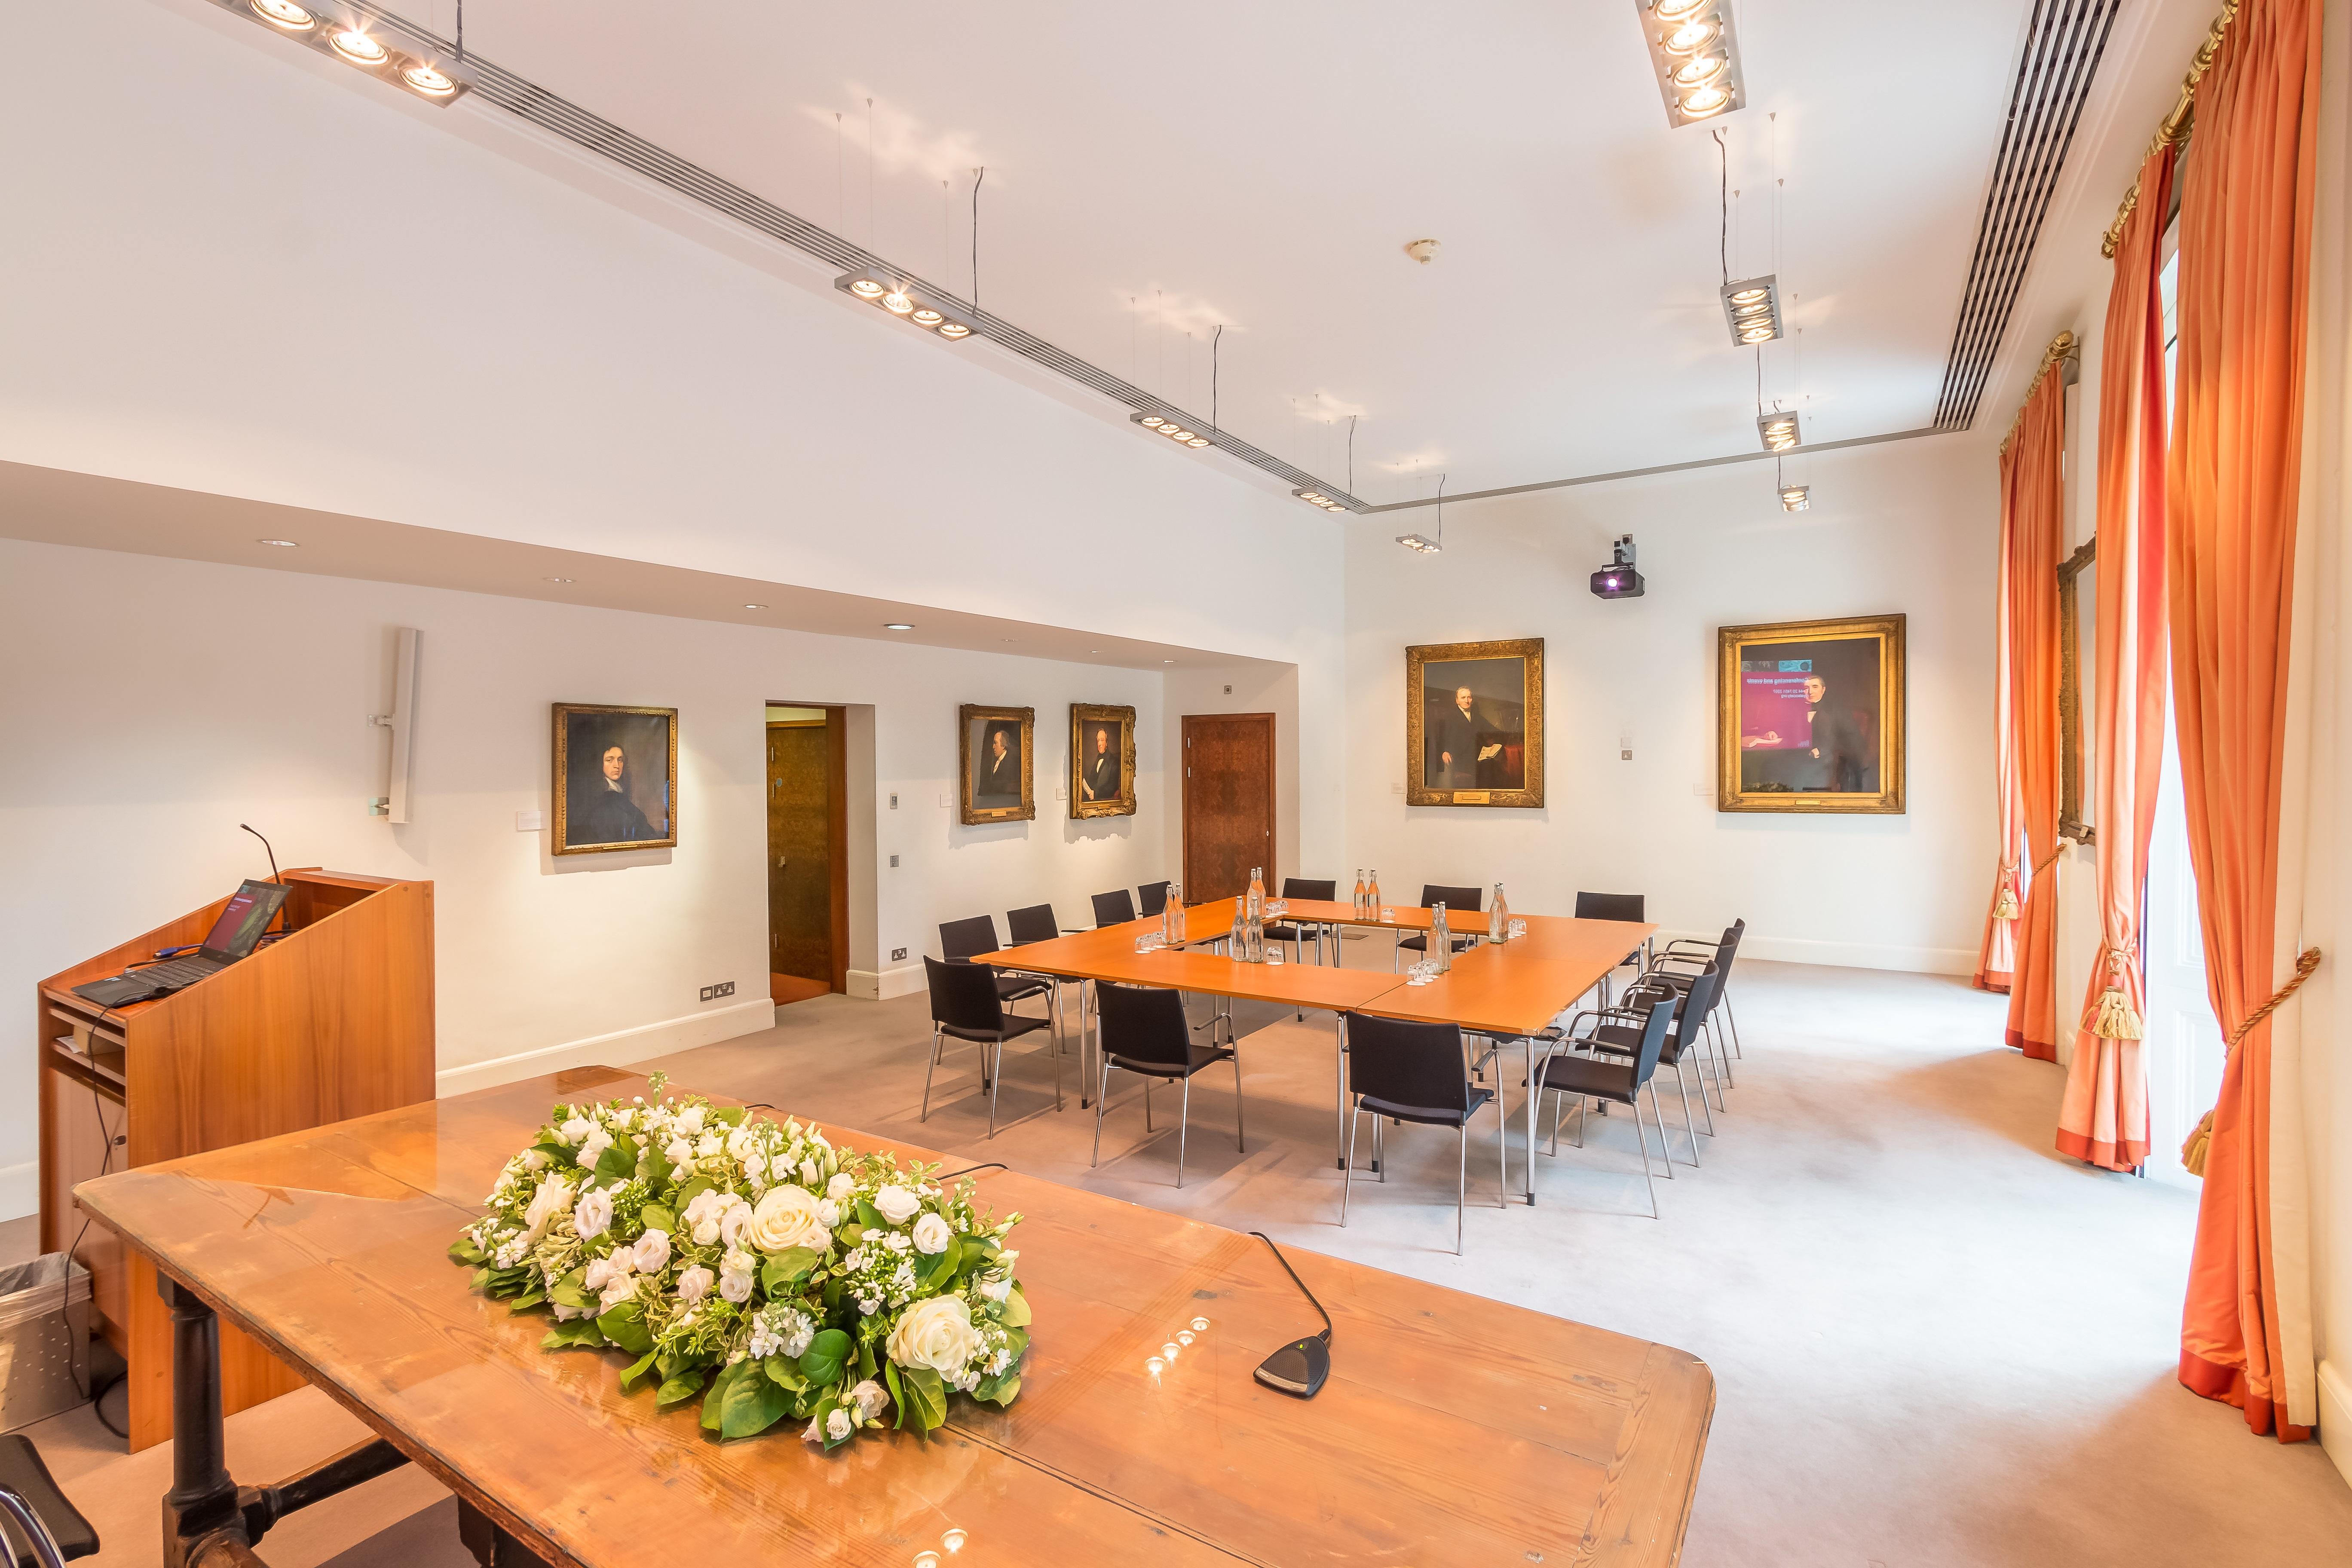 Royal Society Of Medicine Room Hire